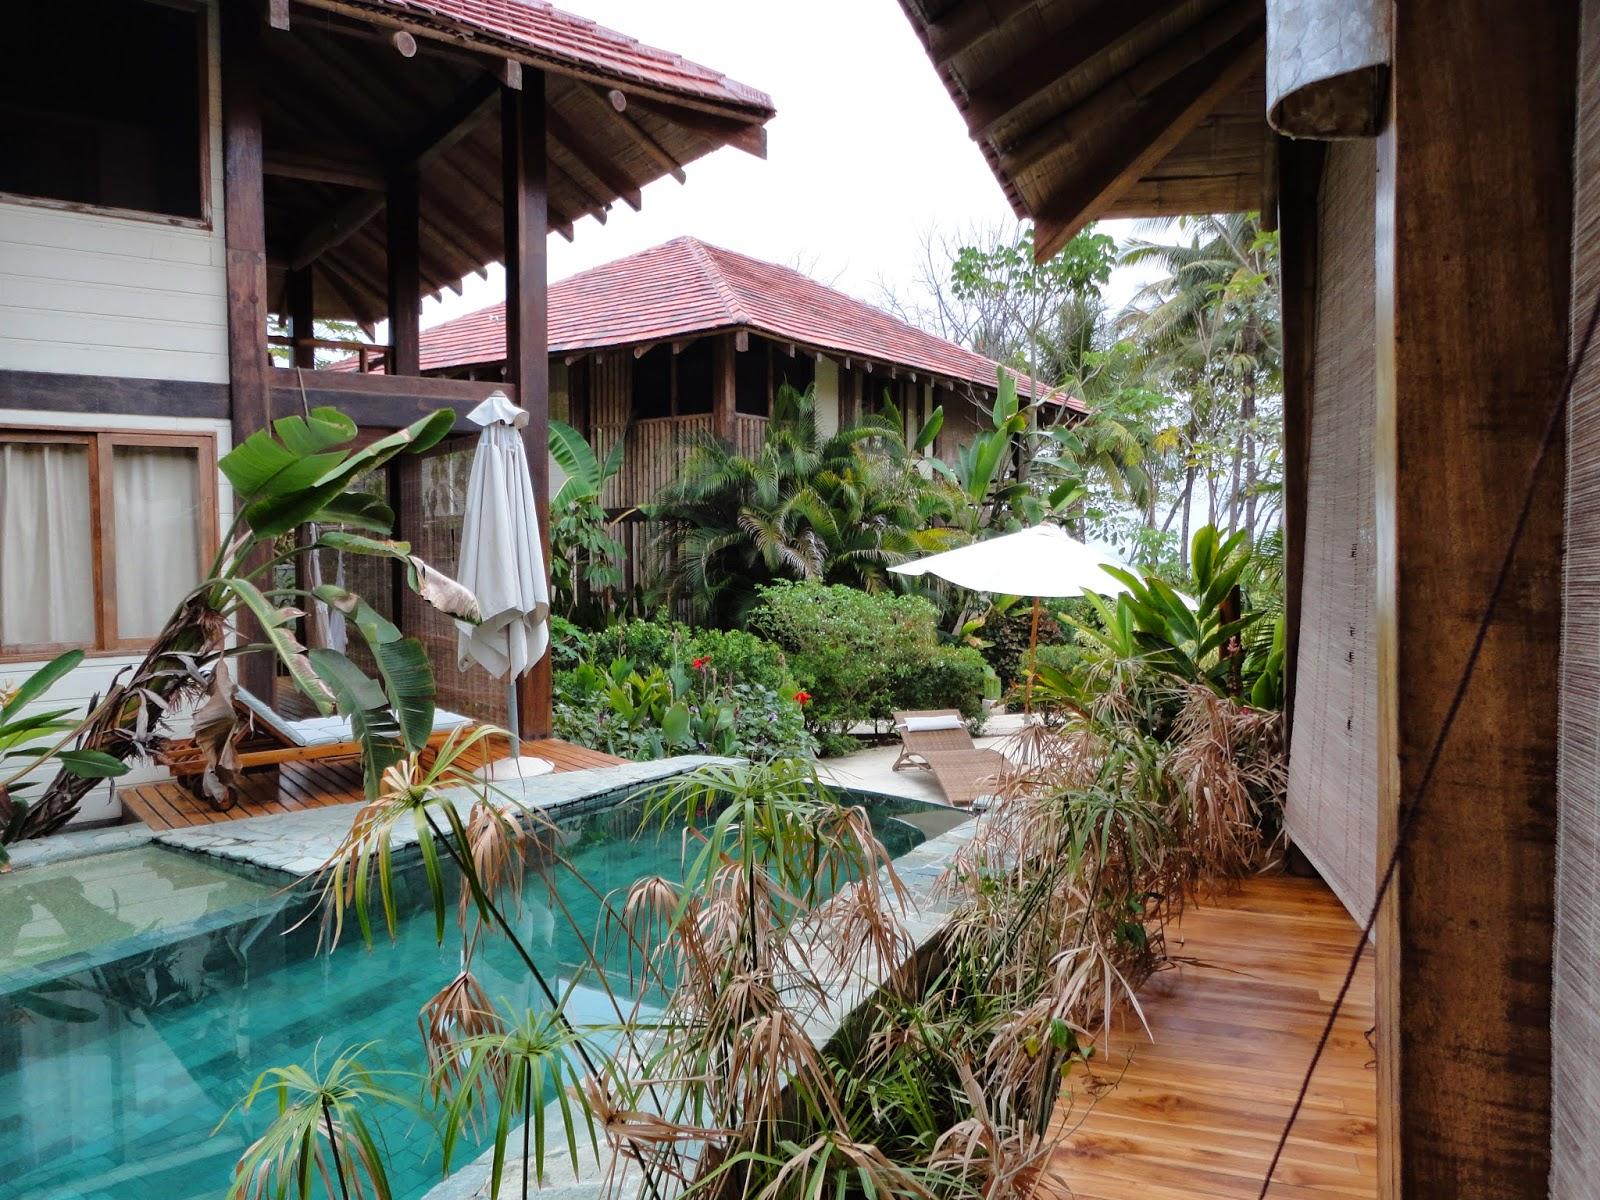 Pramamar's pool